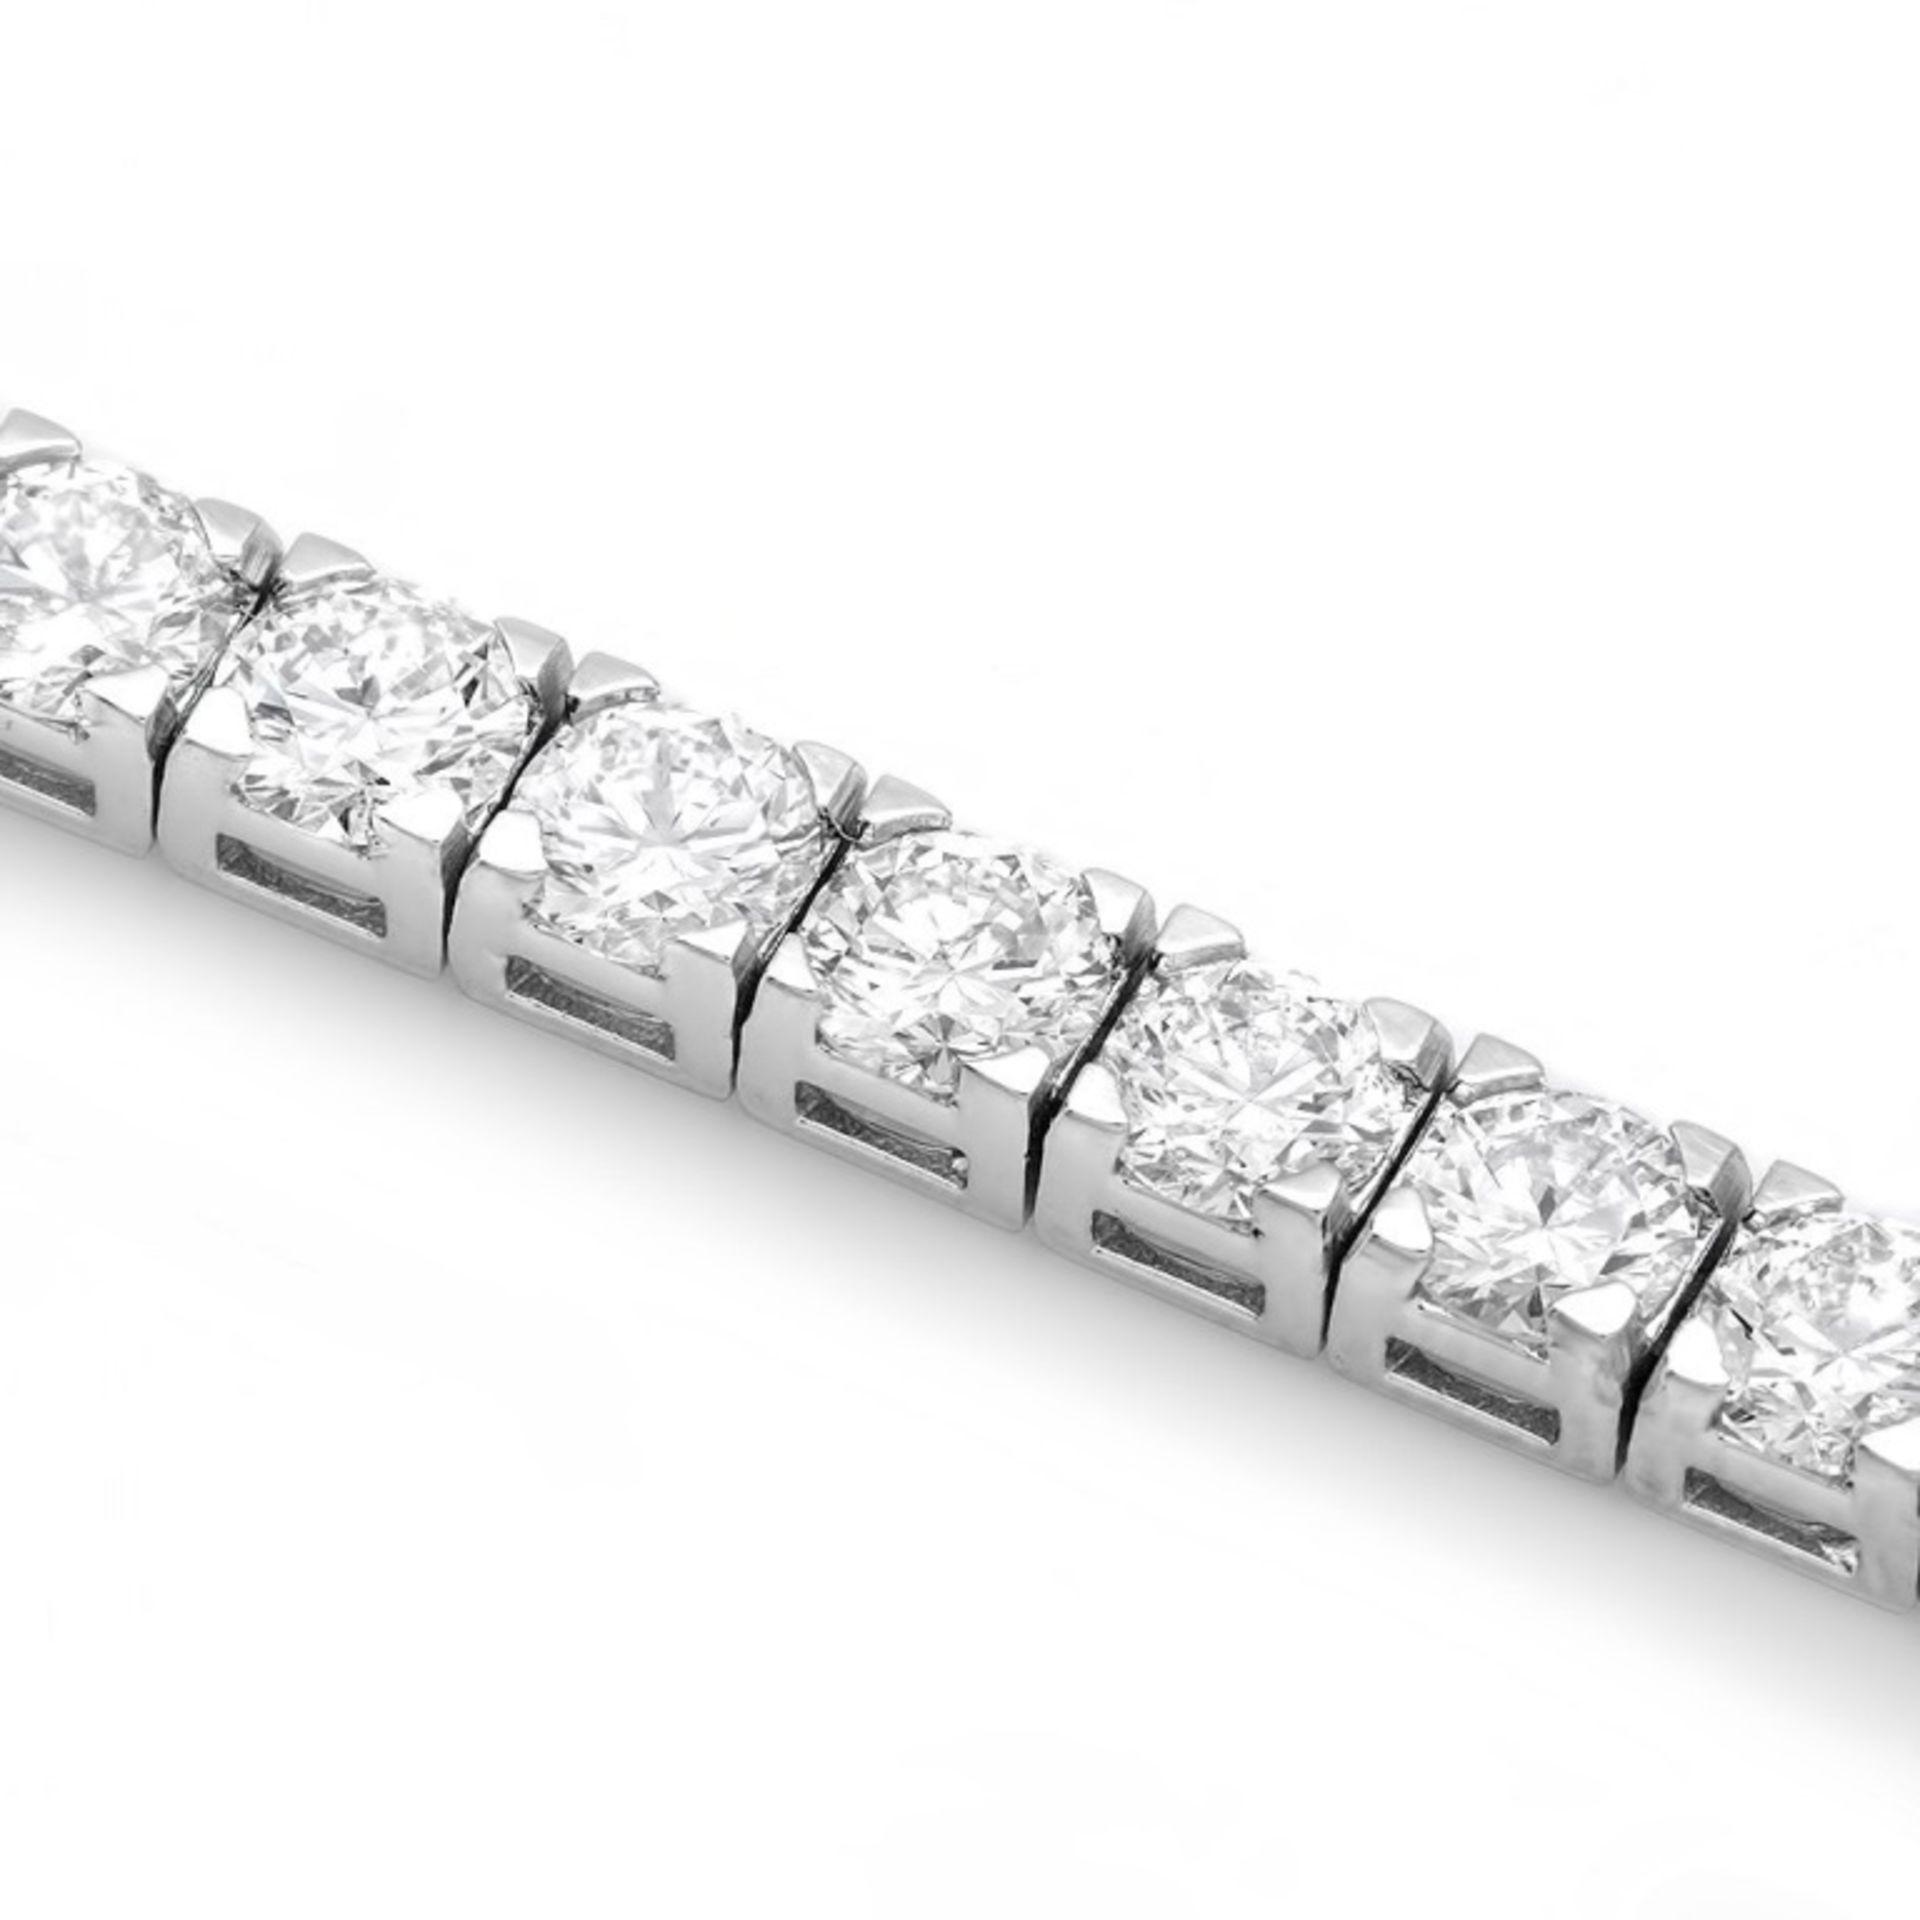 18k White Gold 9.50ct Diamond Tennis Bracelet - Image 2 of 4